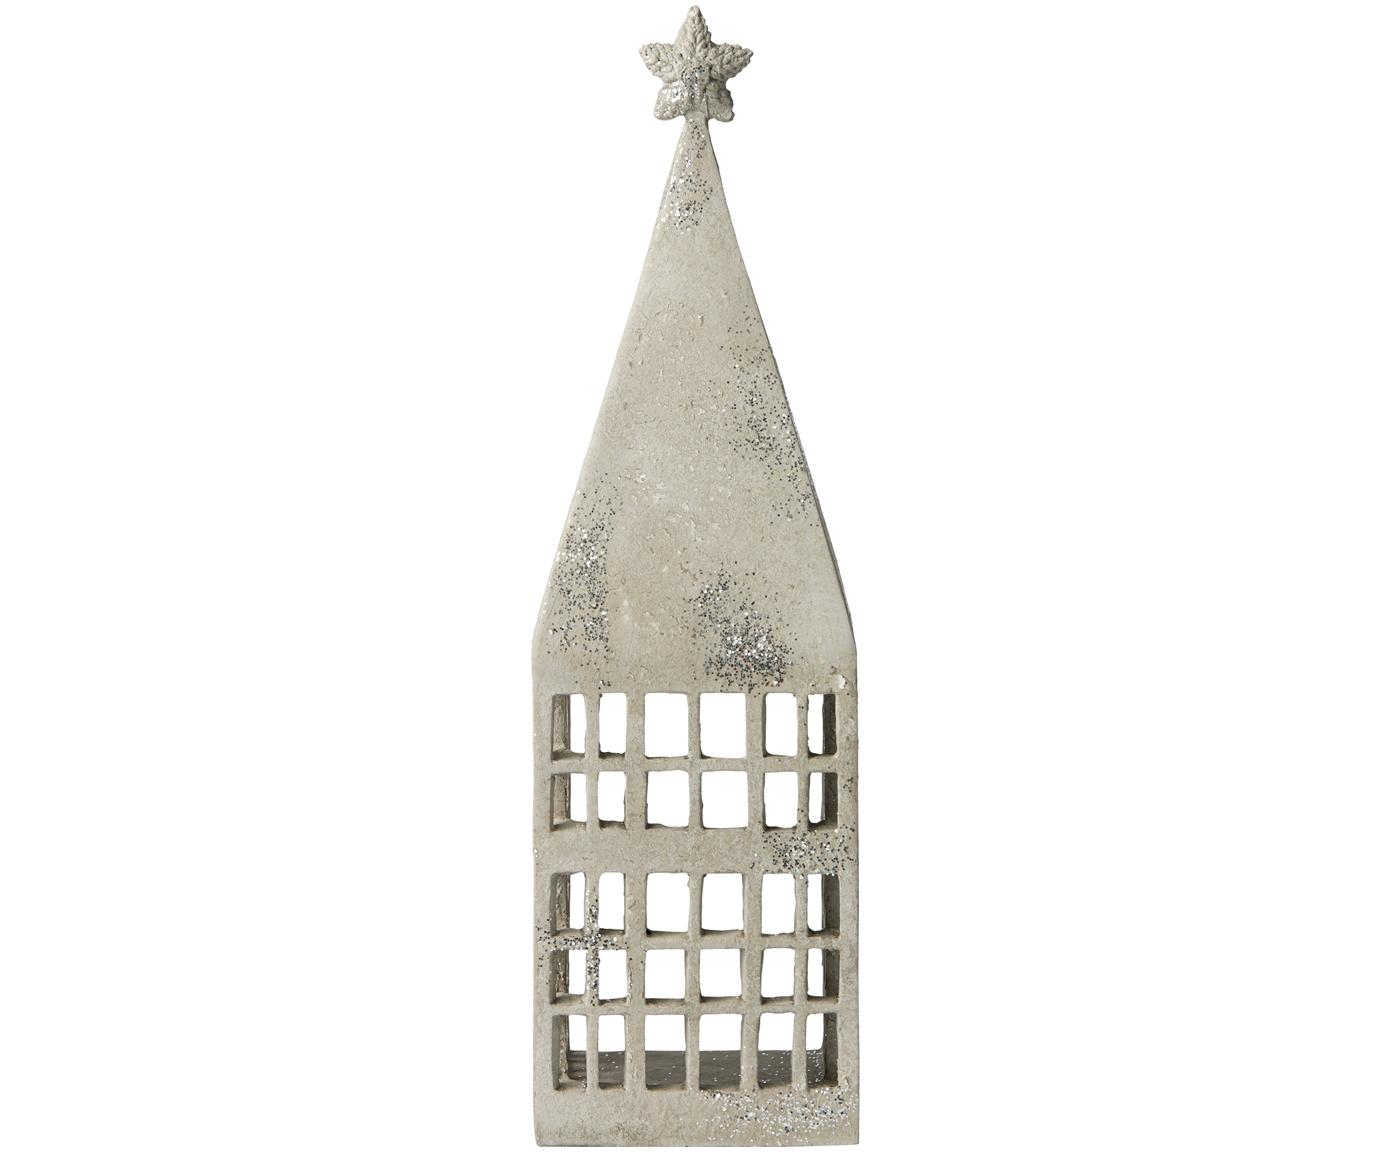 Portacandela Serafina House, Poliresina, Grigio chiaro, argentato, Larg. 10 x Alt. 33 cm